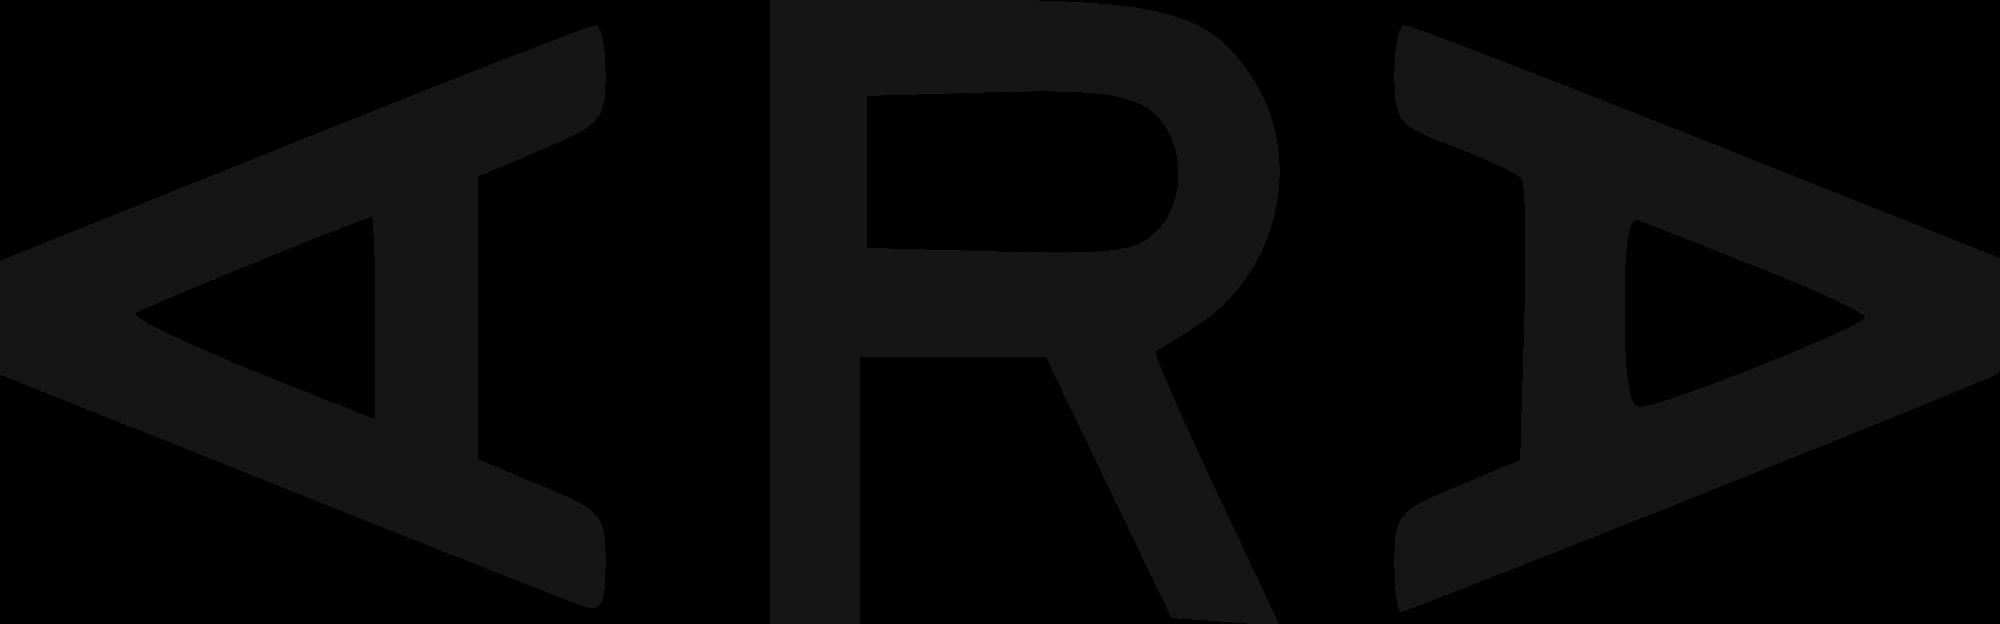 Open PlusPng.com  - Logo A Project PNG